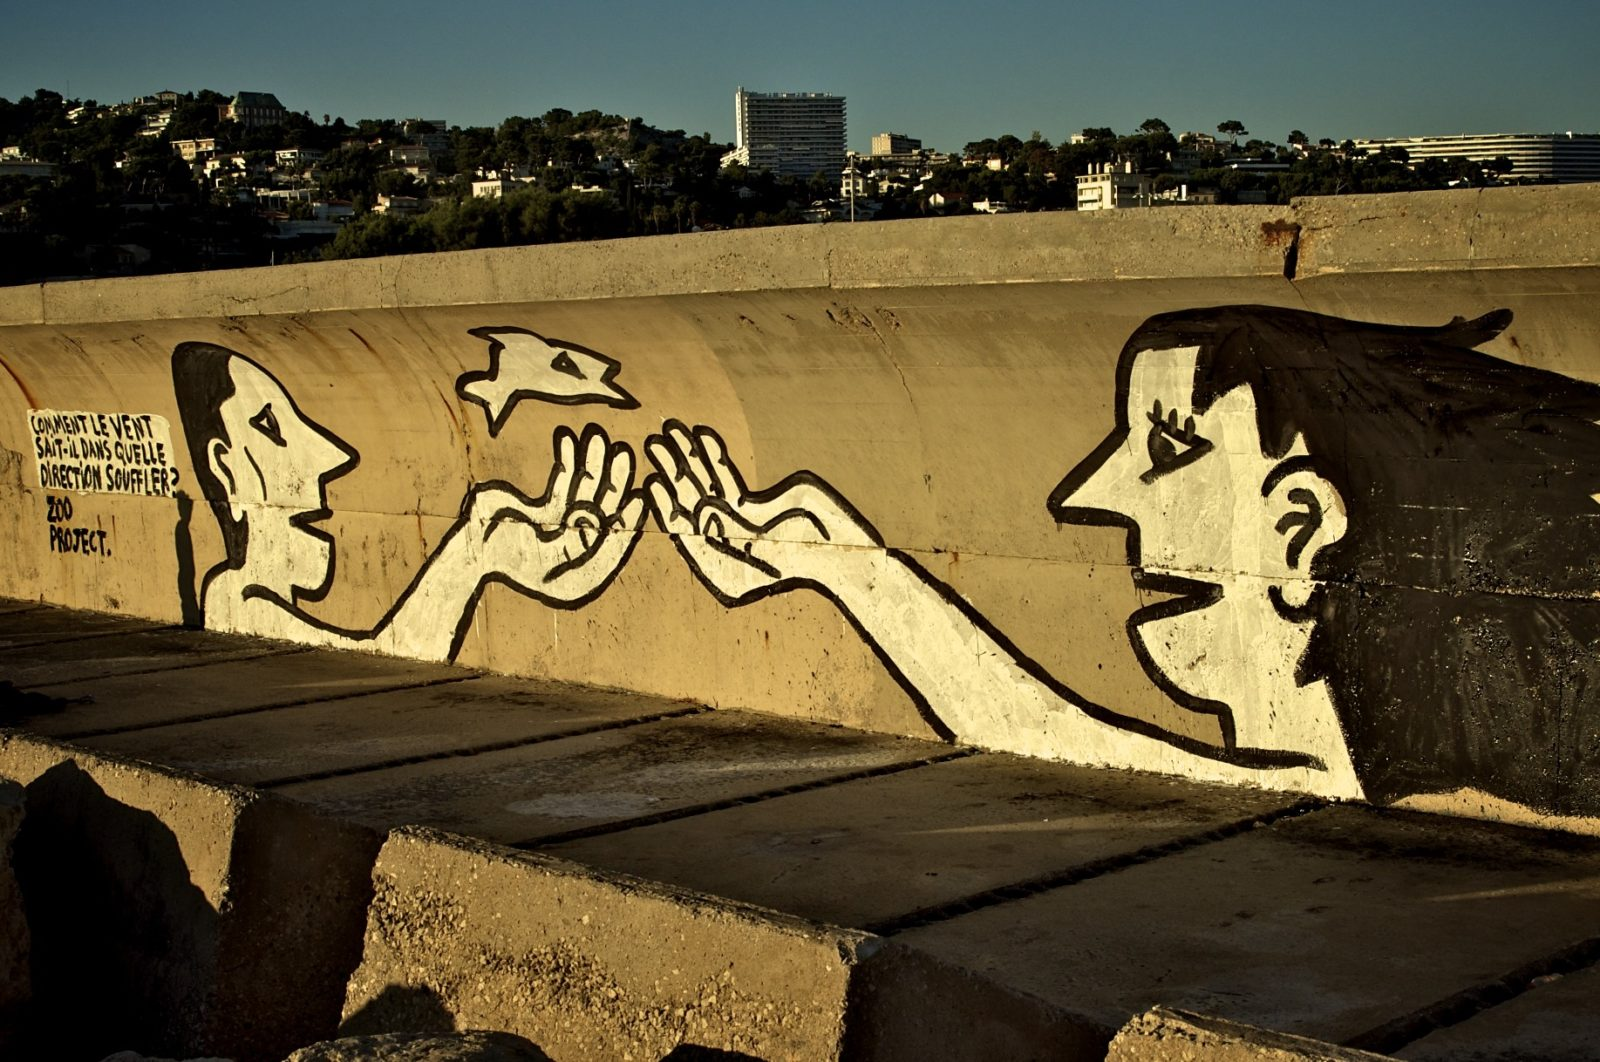 ooproject hommage bilalberreni streetart ulule radar murale marseille graffiti tommenigault - Coup de pouce RADAR x Ulule : Hommage à Zoo project